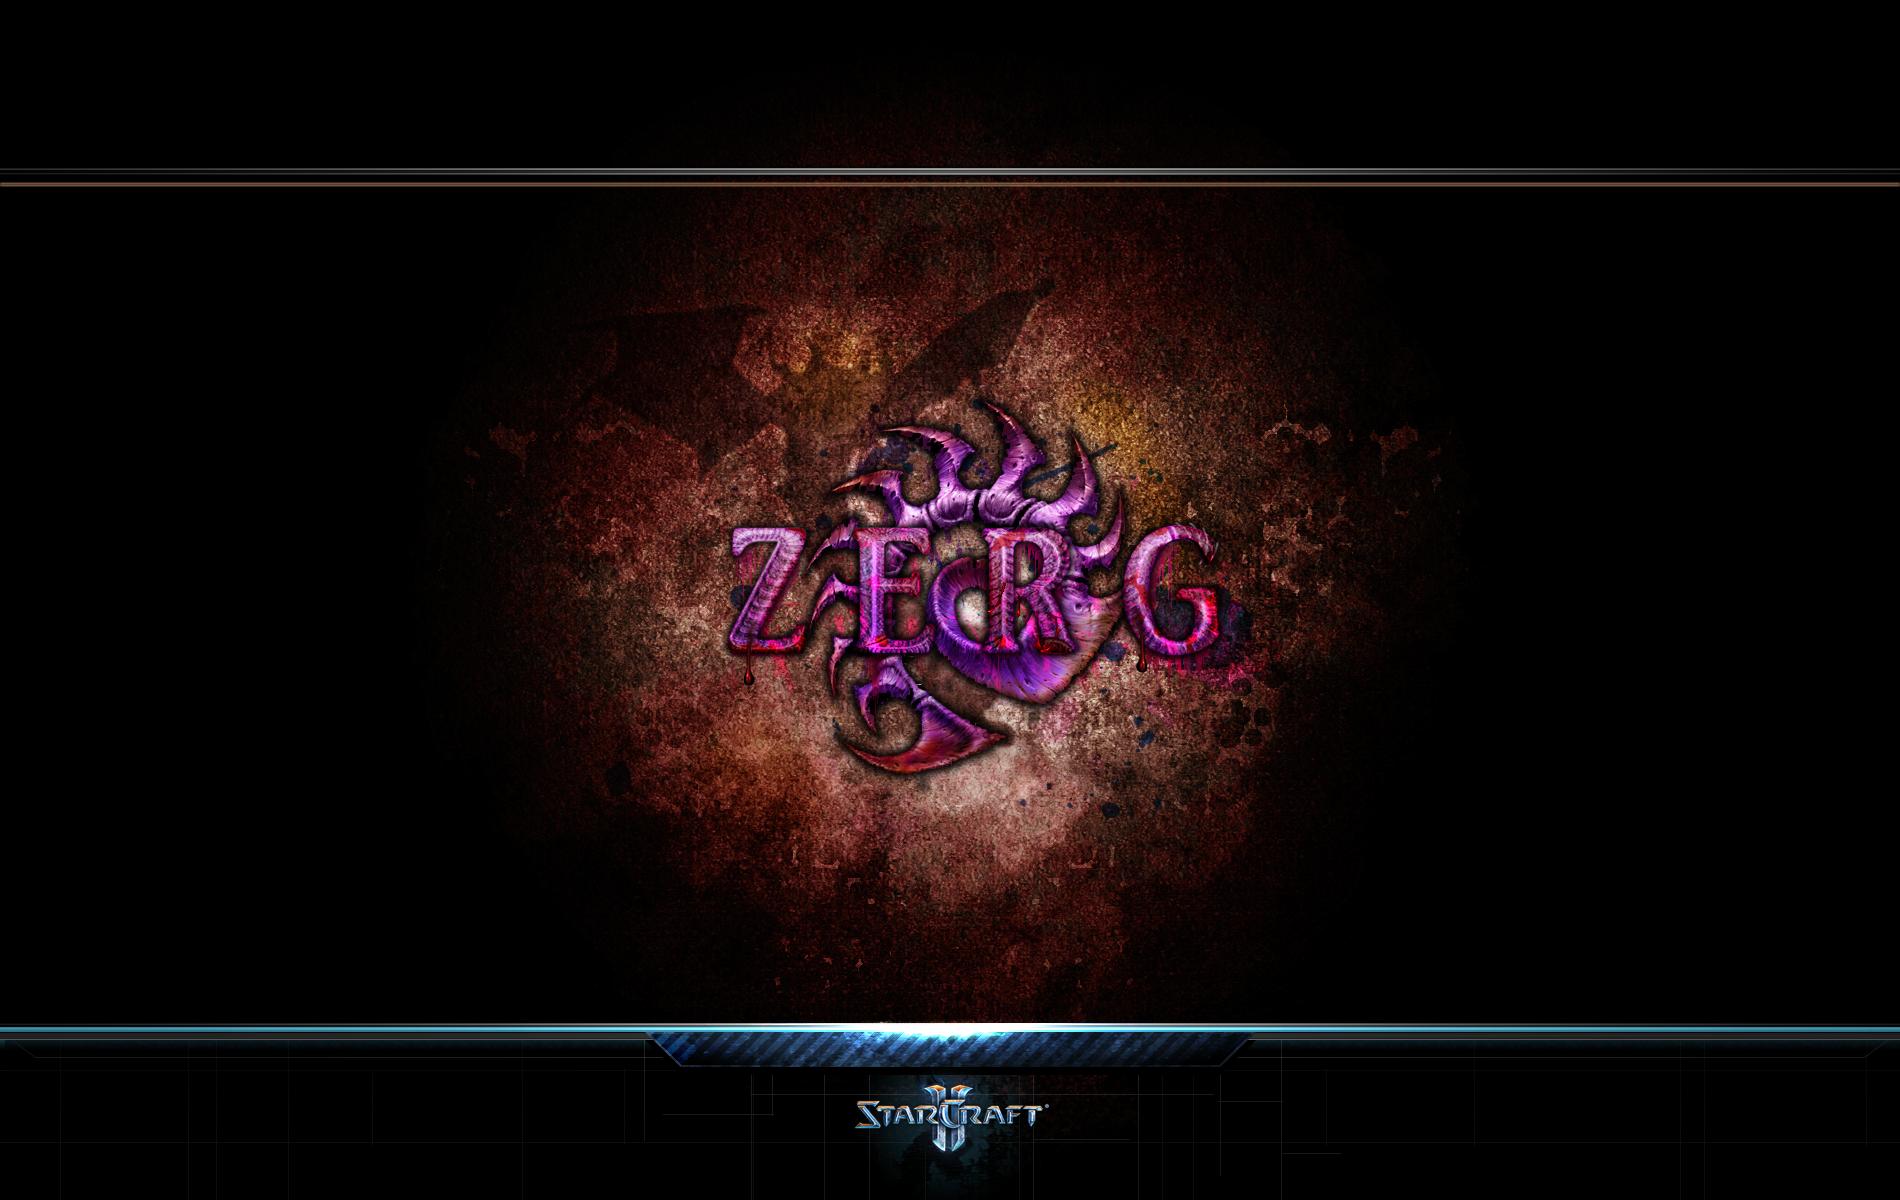 Starcraft ii zerg wp by easydisplayname on deviantart - Starcraft 2 wallpaper art ...